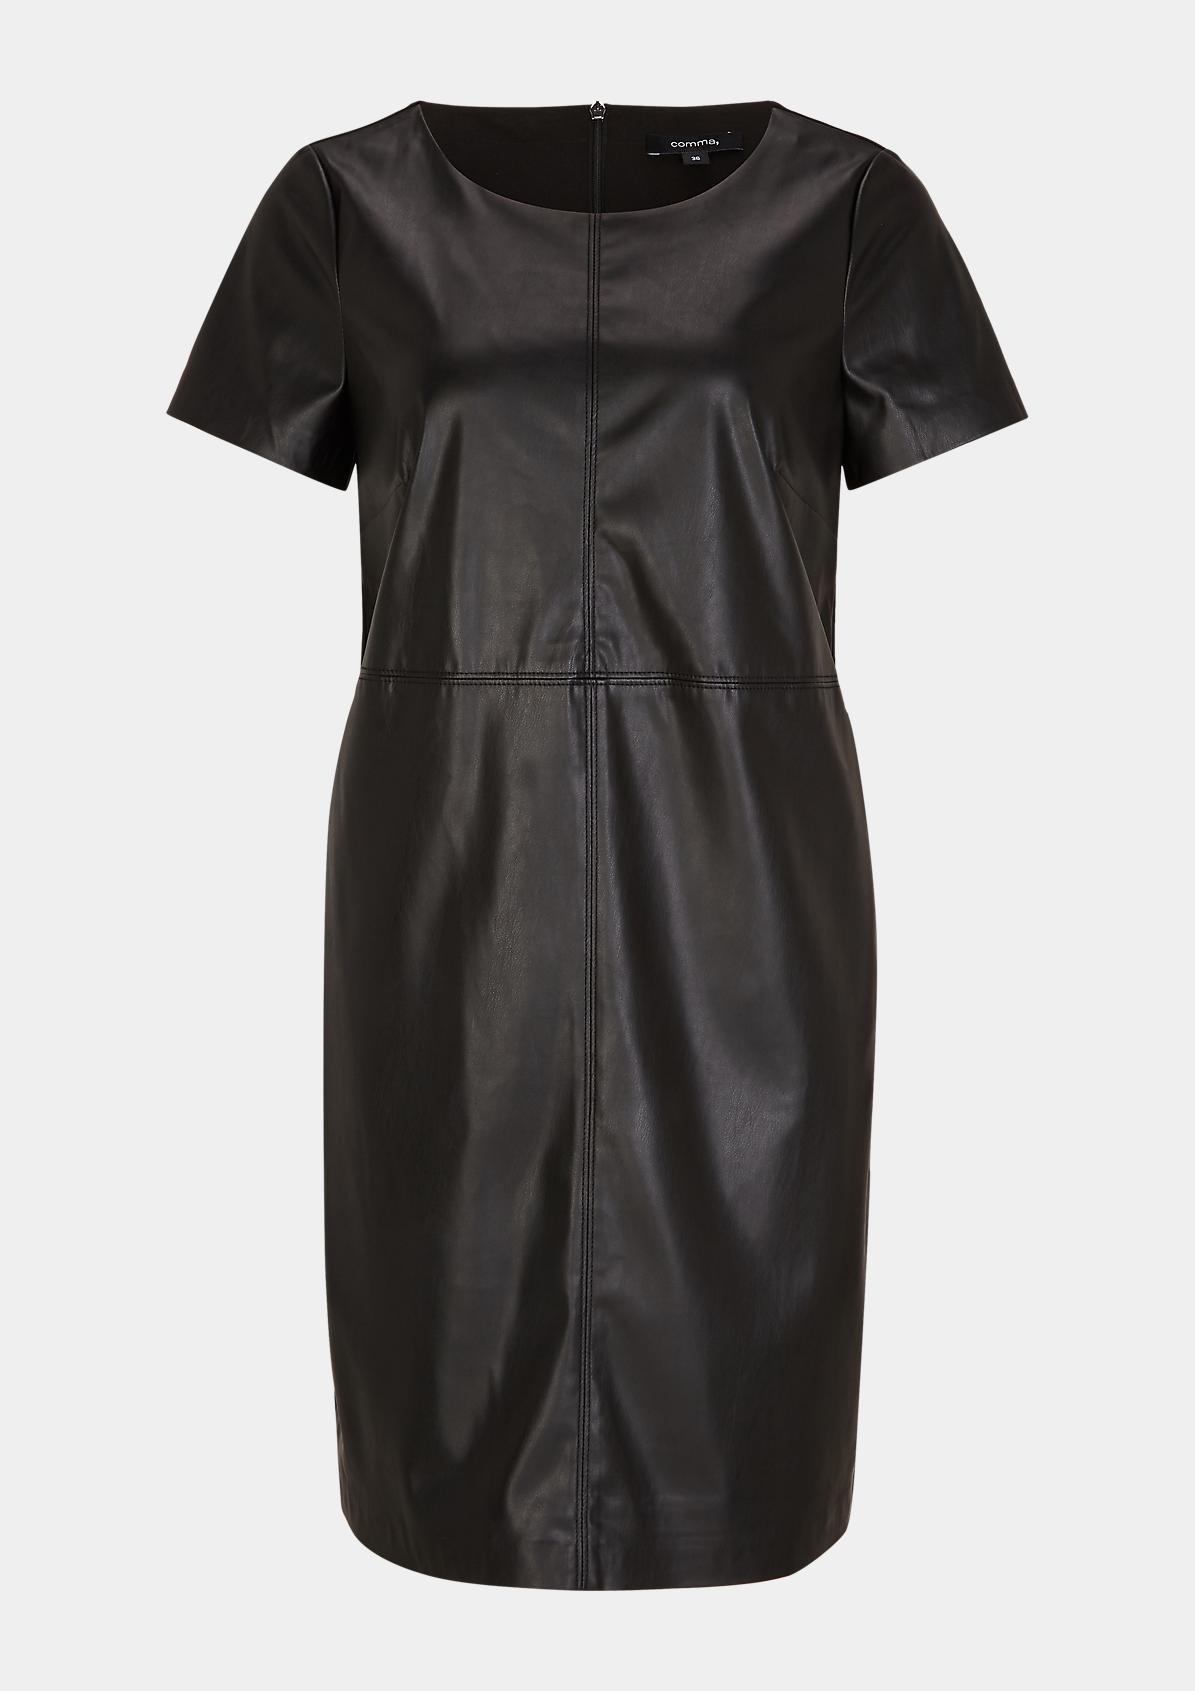 Fabricmix-Kleid mit Fake Leather